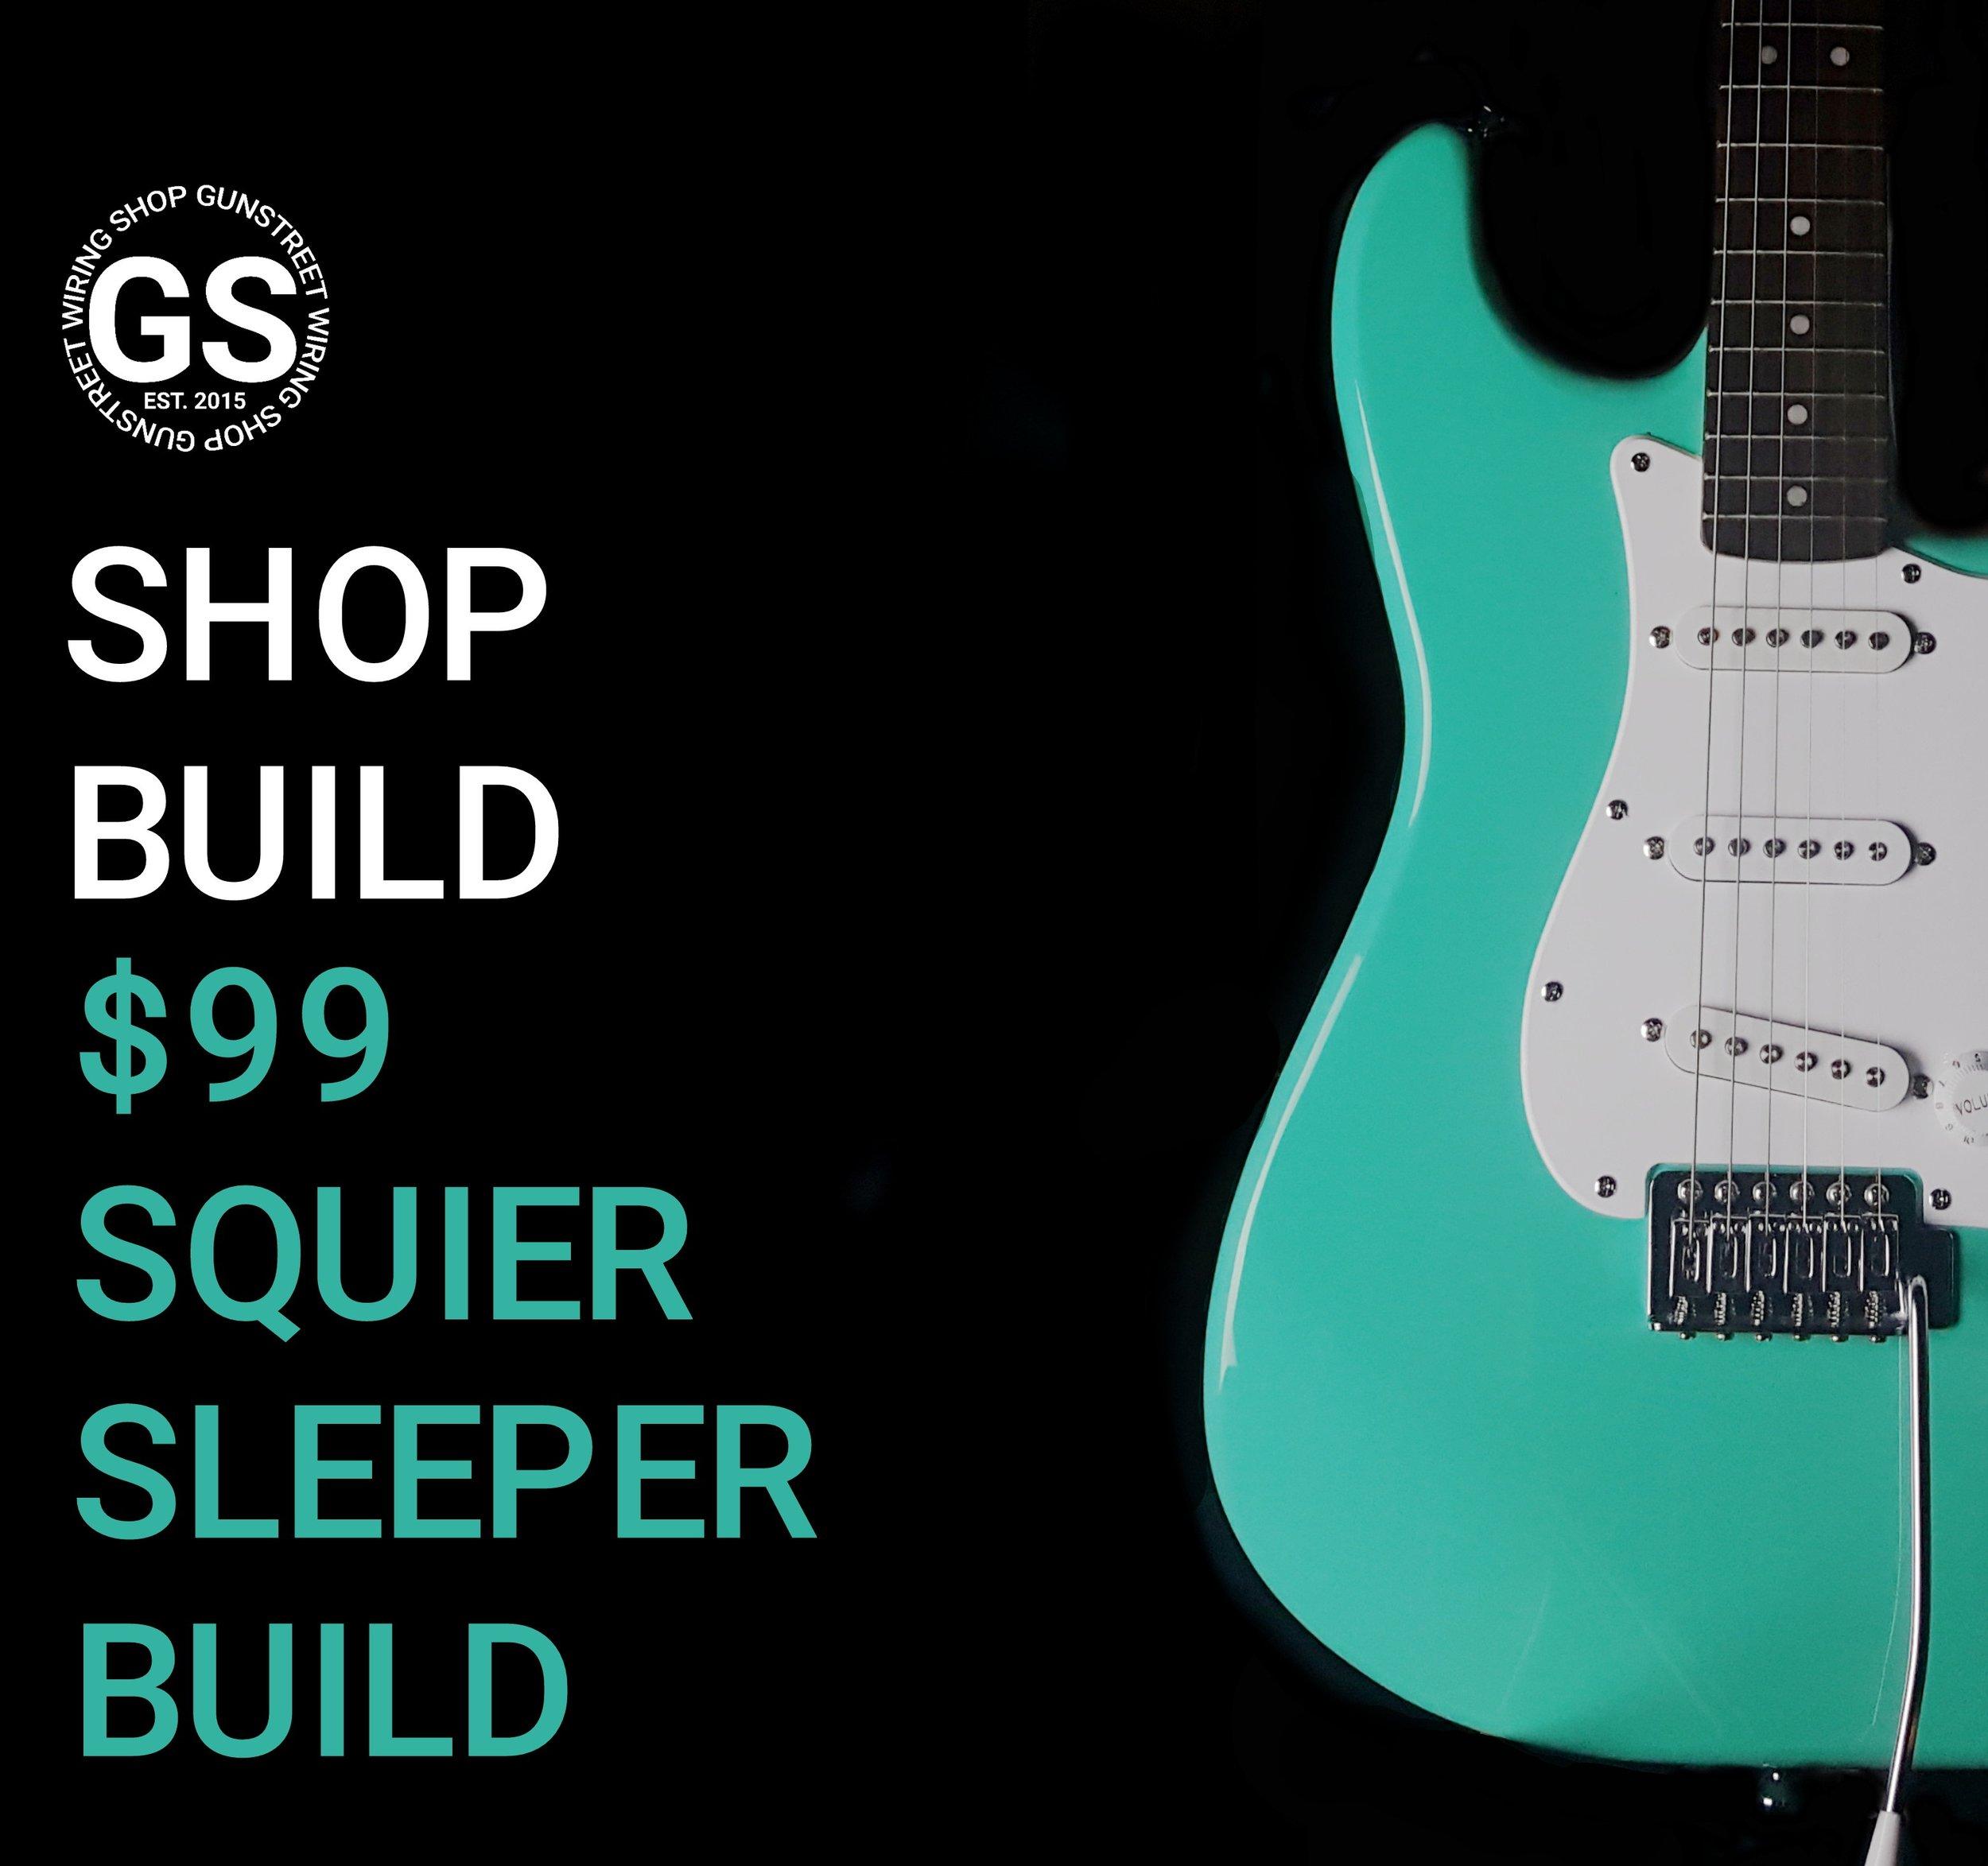 99 squier sleeper build.jpg